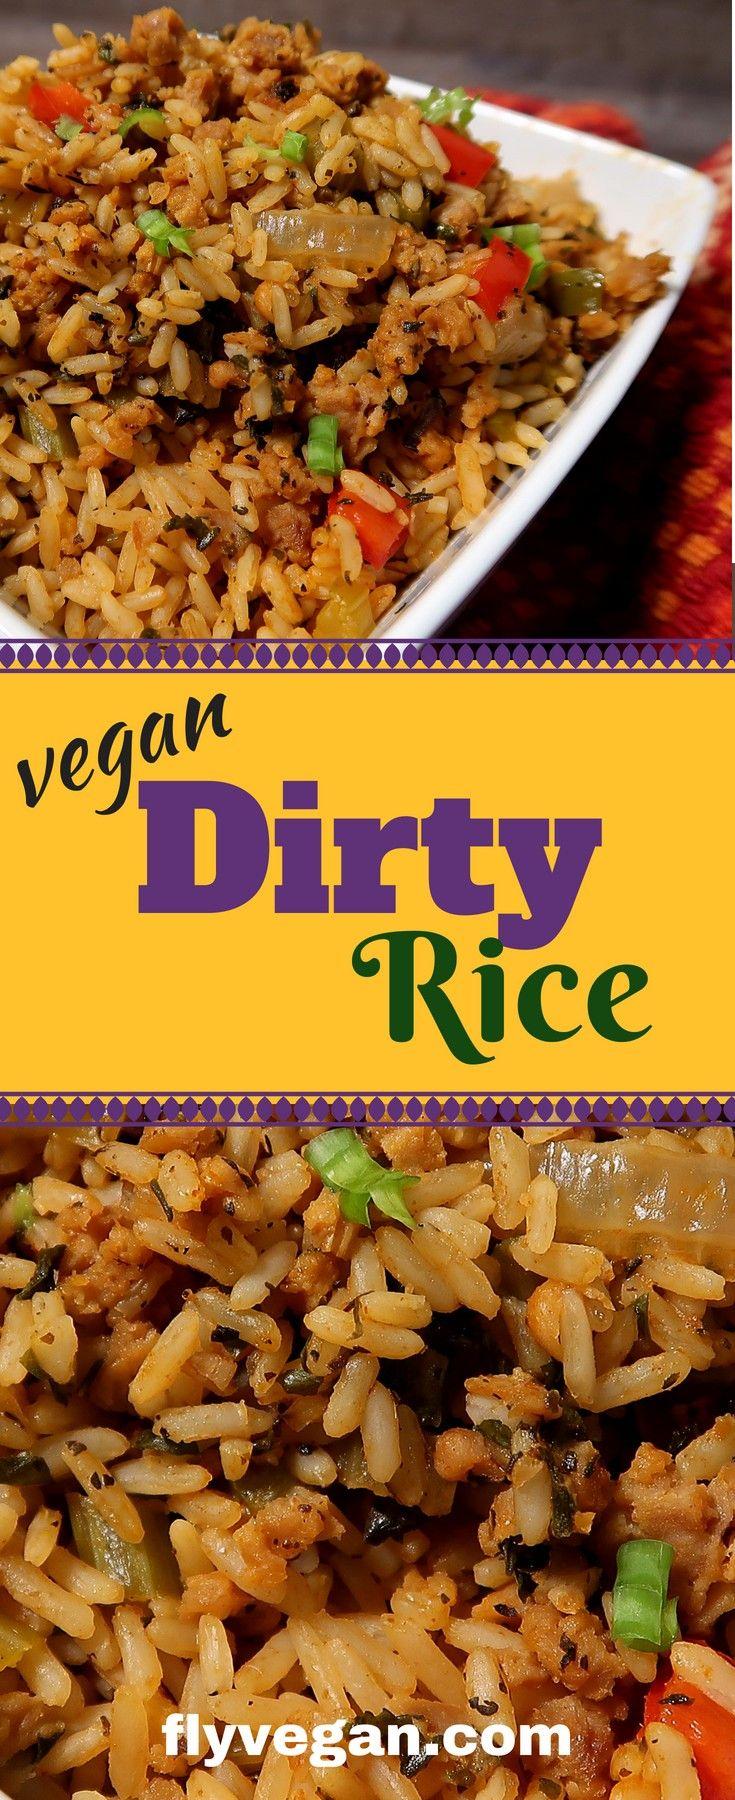 Vegan Cajun Rice Dirty Rice Recipe Lifestyle Shift